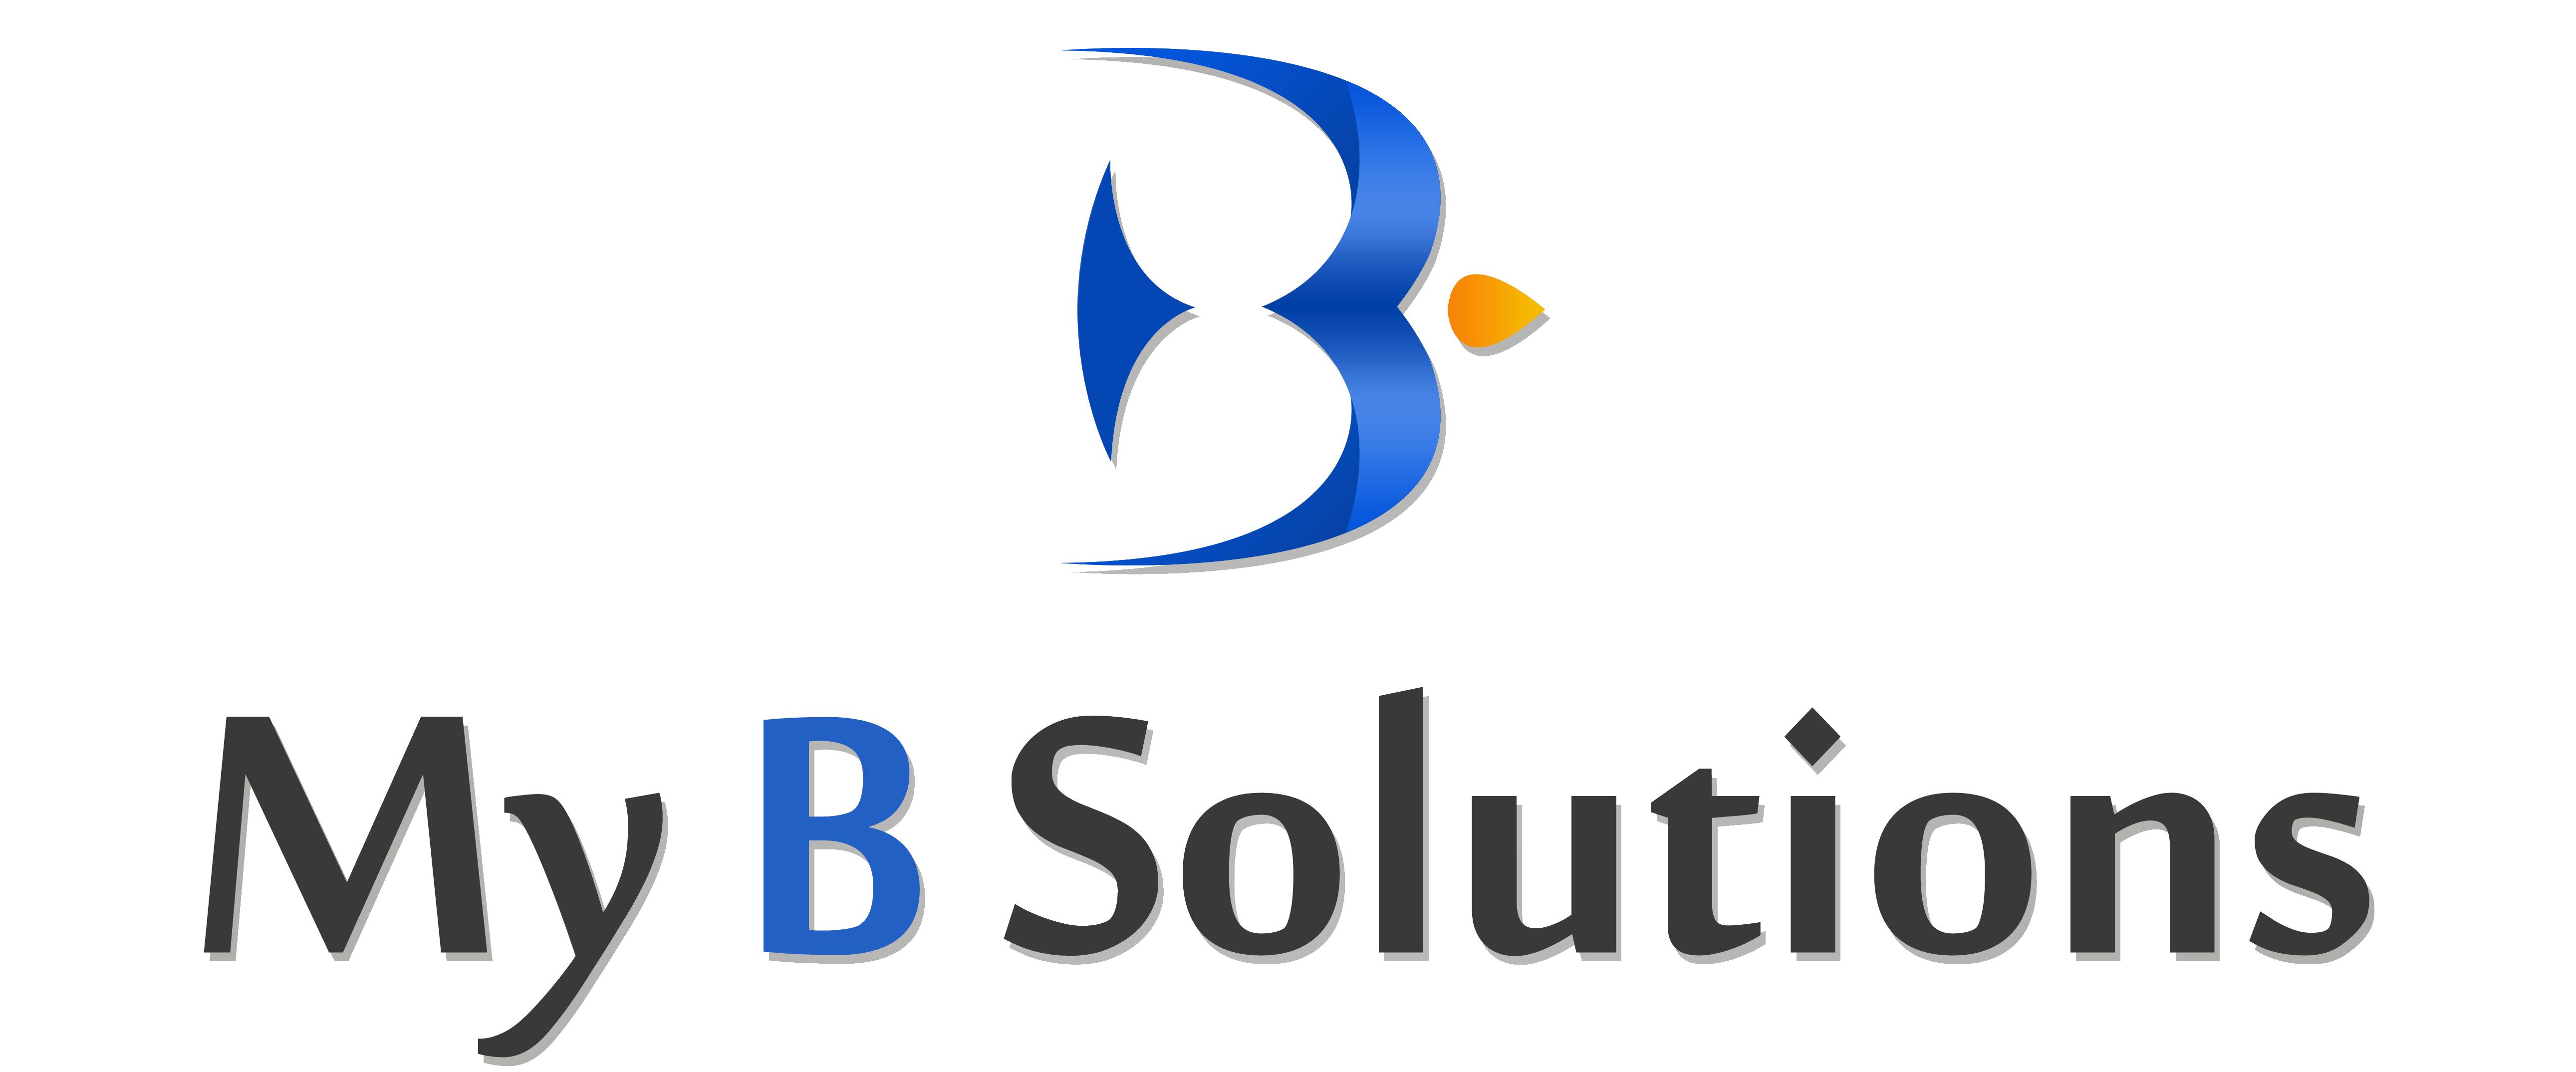 My B Solutions